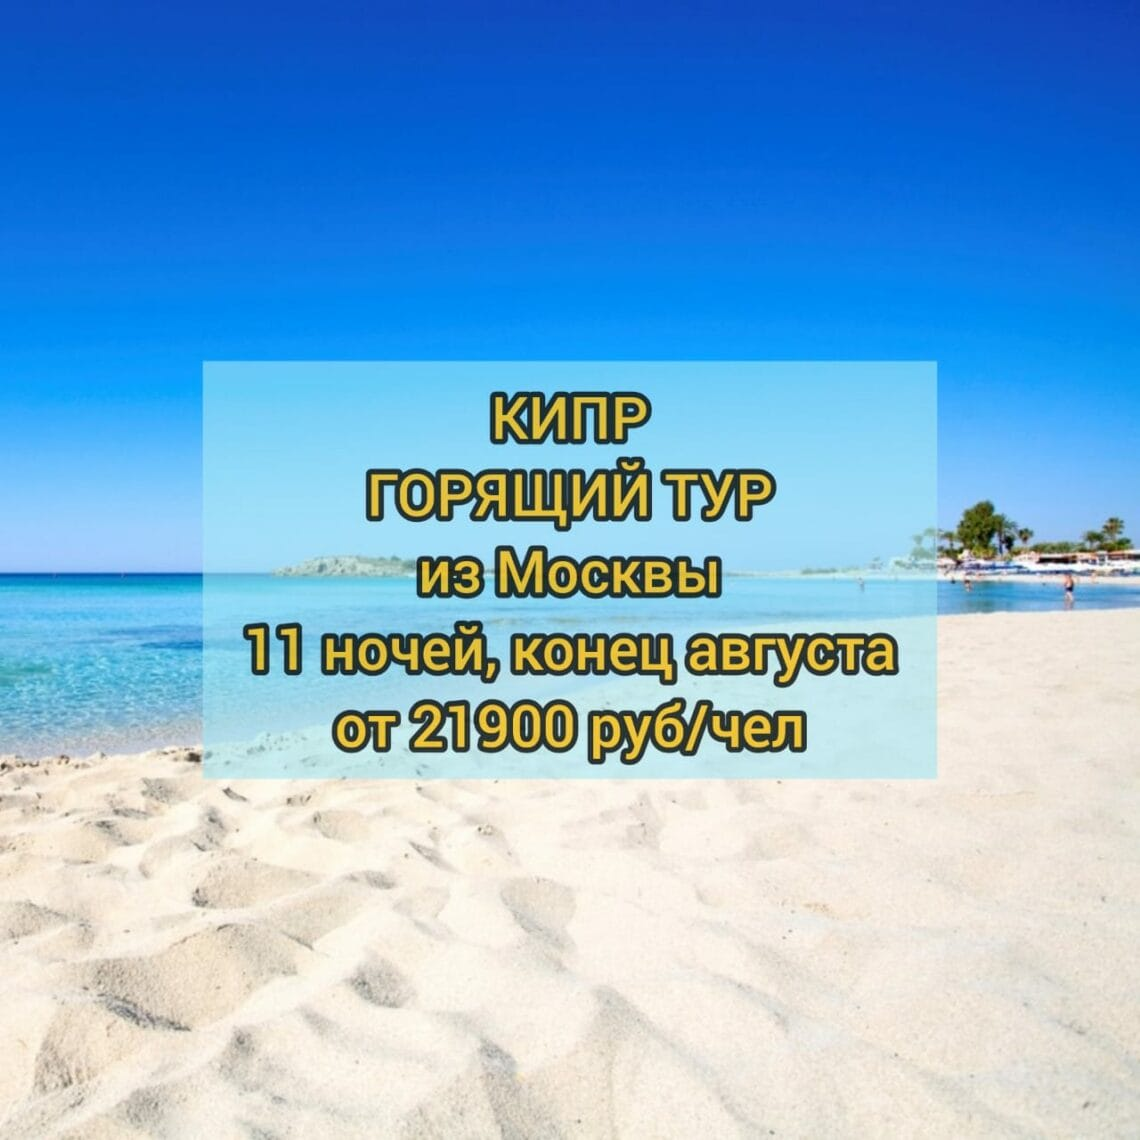 Горящий тур на Кипр в августе